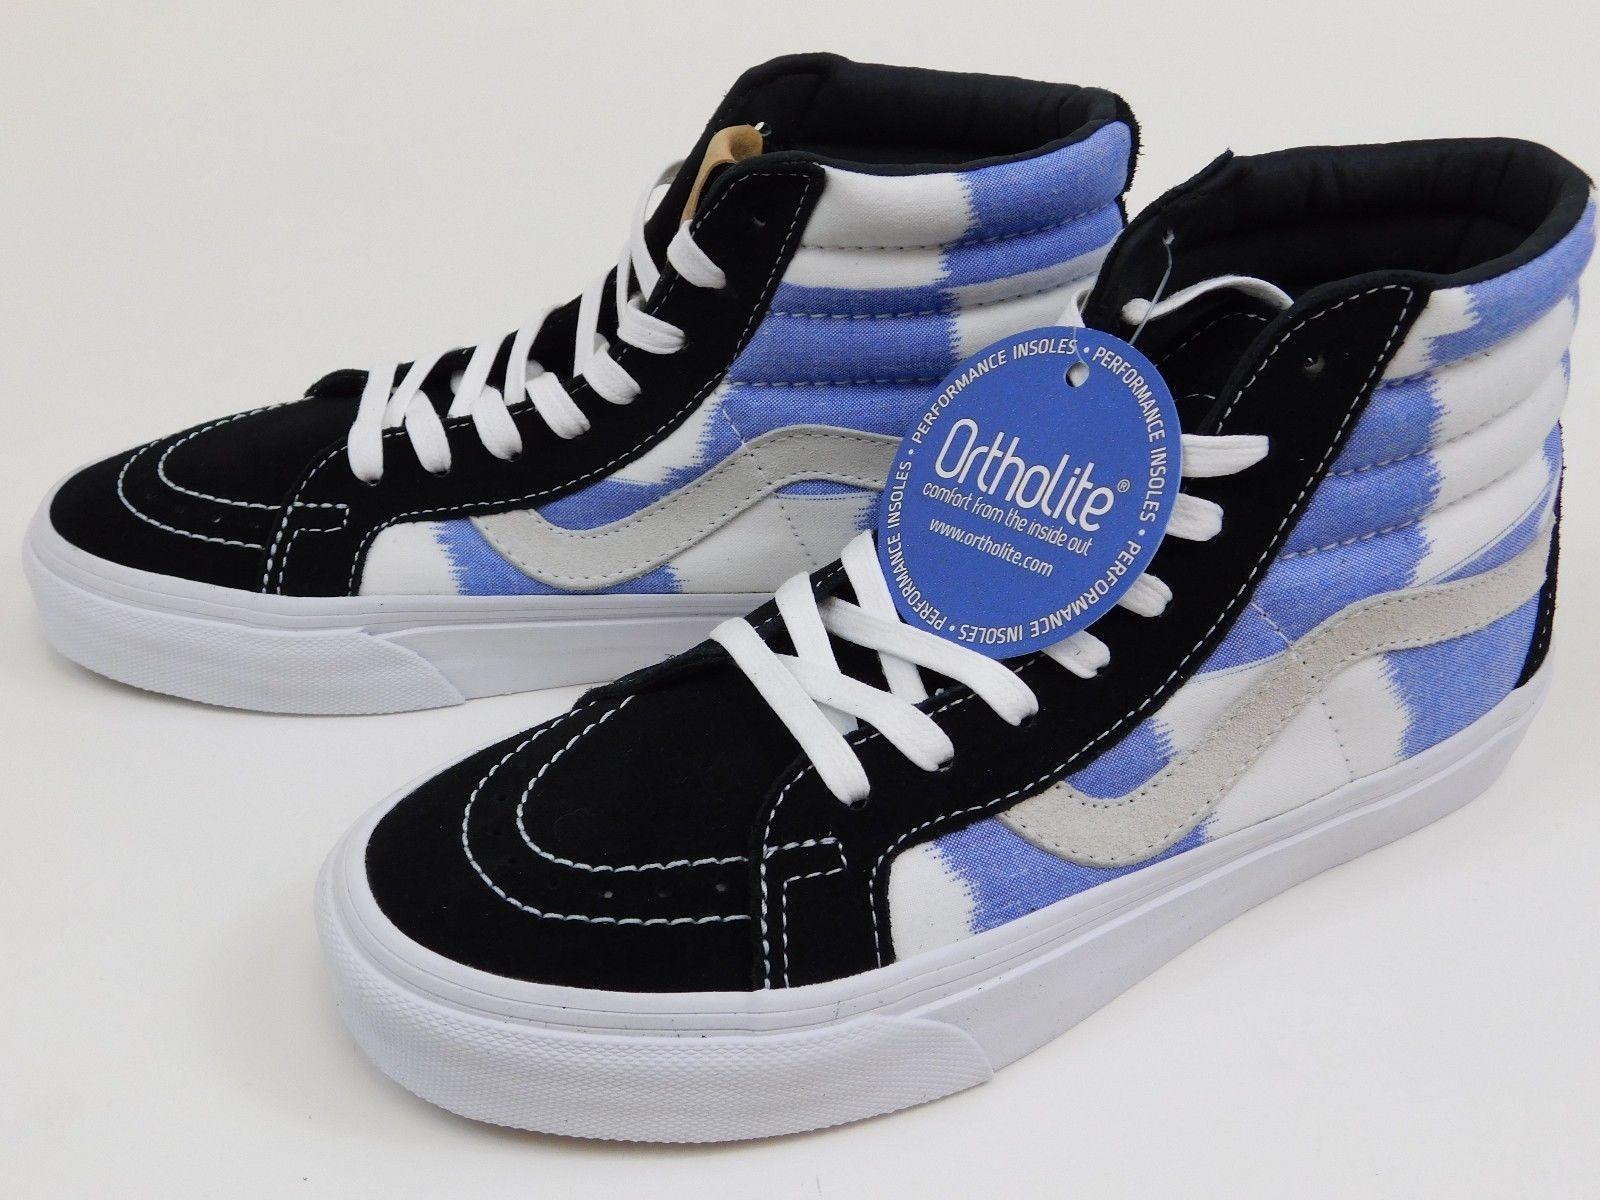 New Vans SK8-HI Reissue Glitch Check Sneakers Size US 8 Men's Shoes